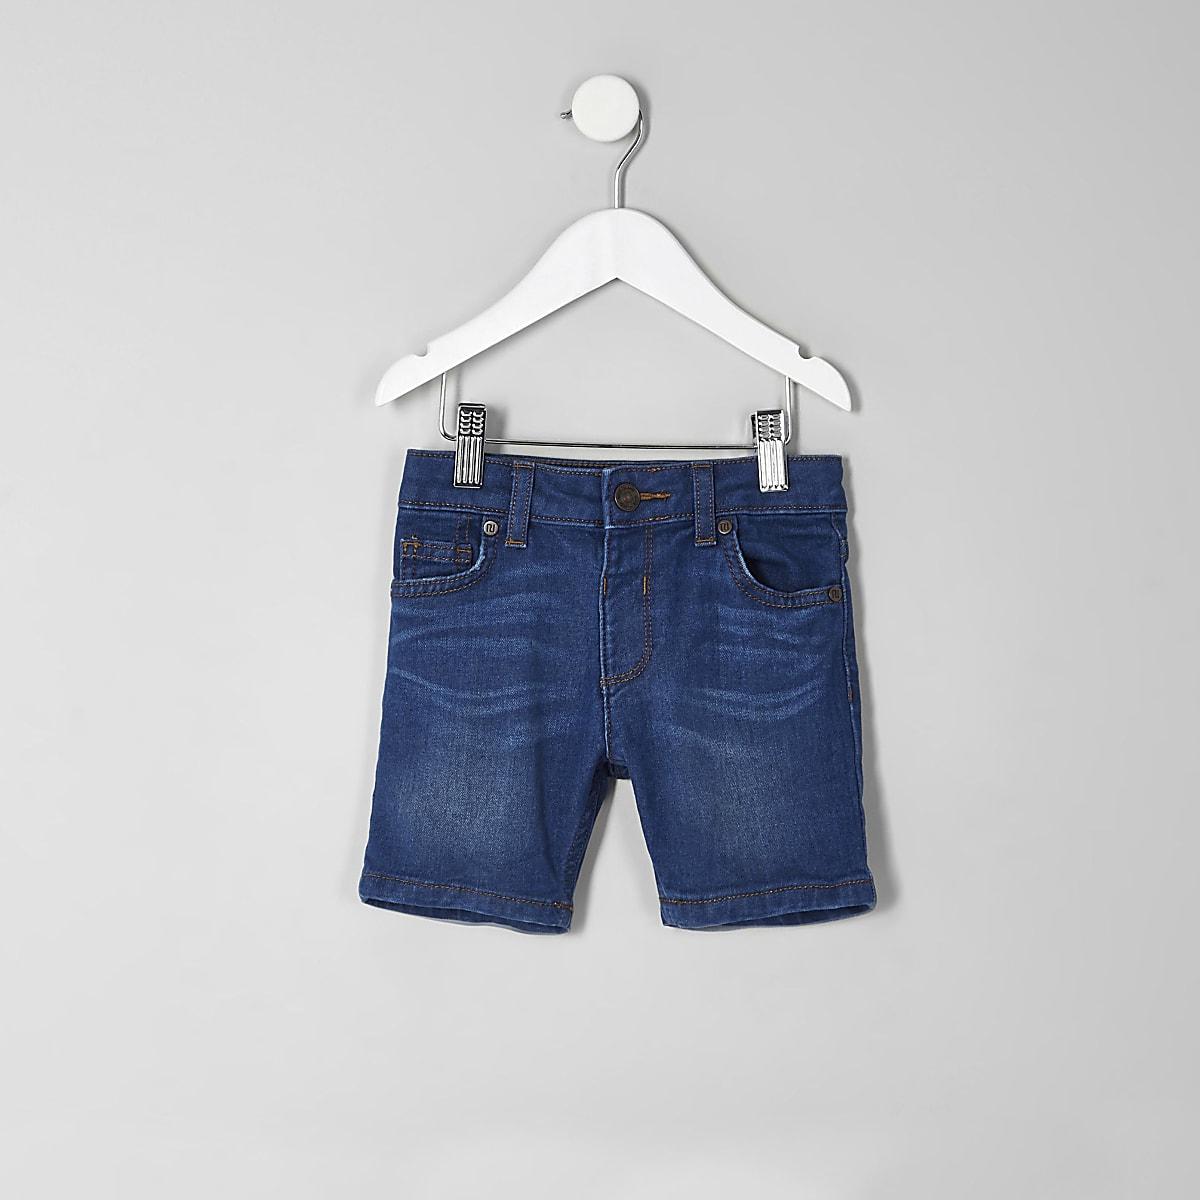 12c391be1dbe0 Dylan – Short en jean bleu slim mini garçon - Shorts bébé garçon ...